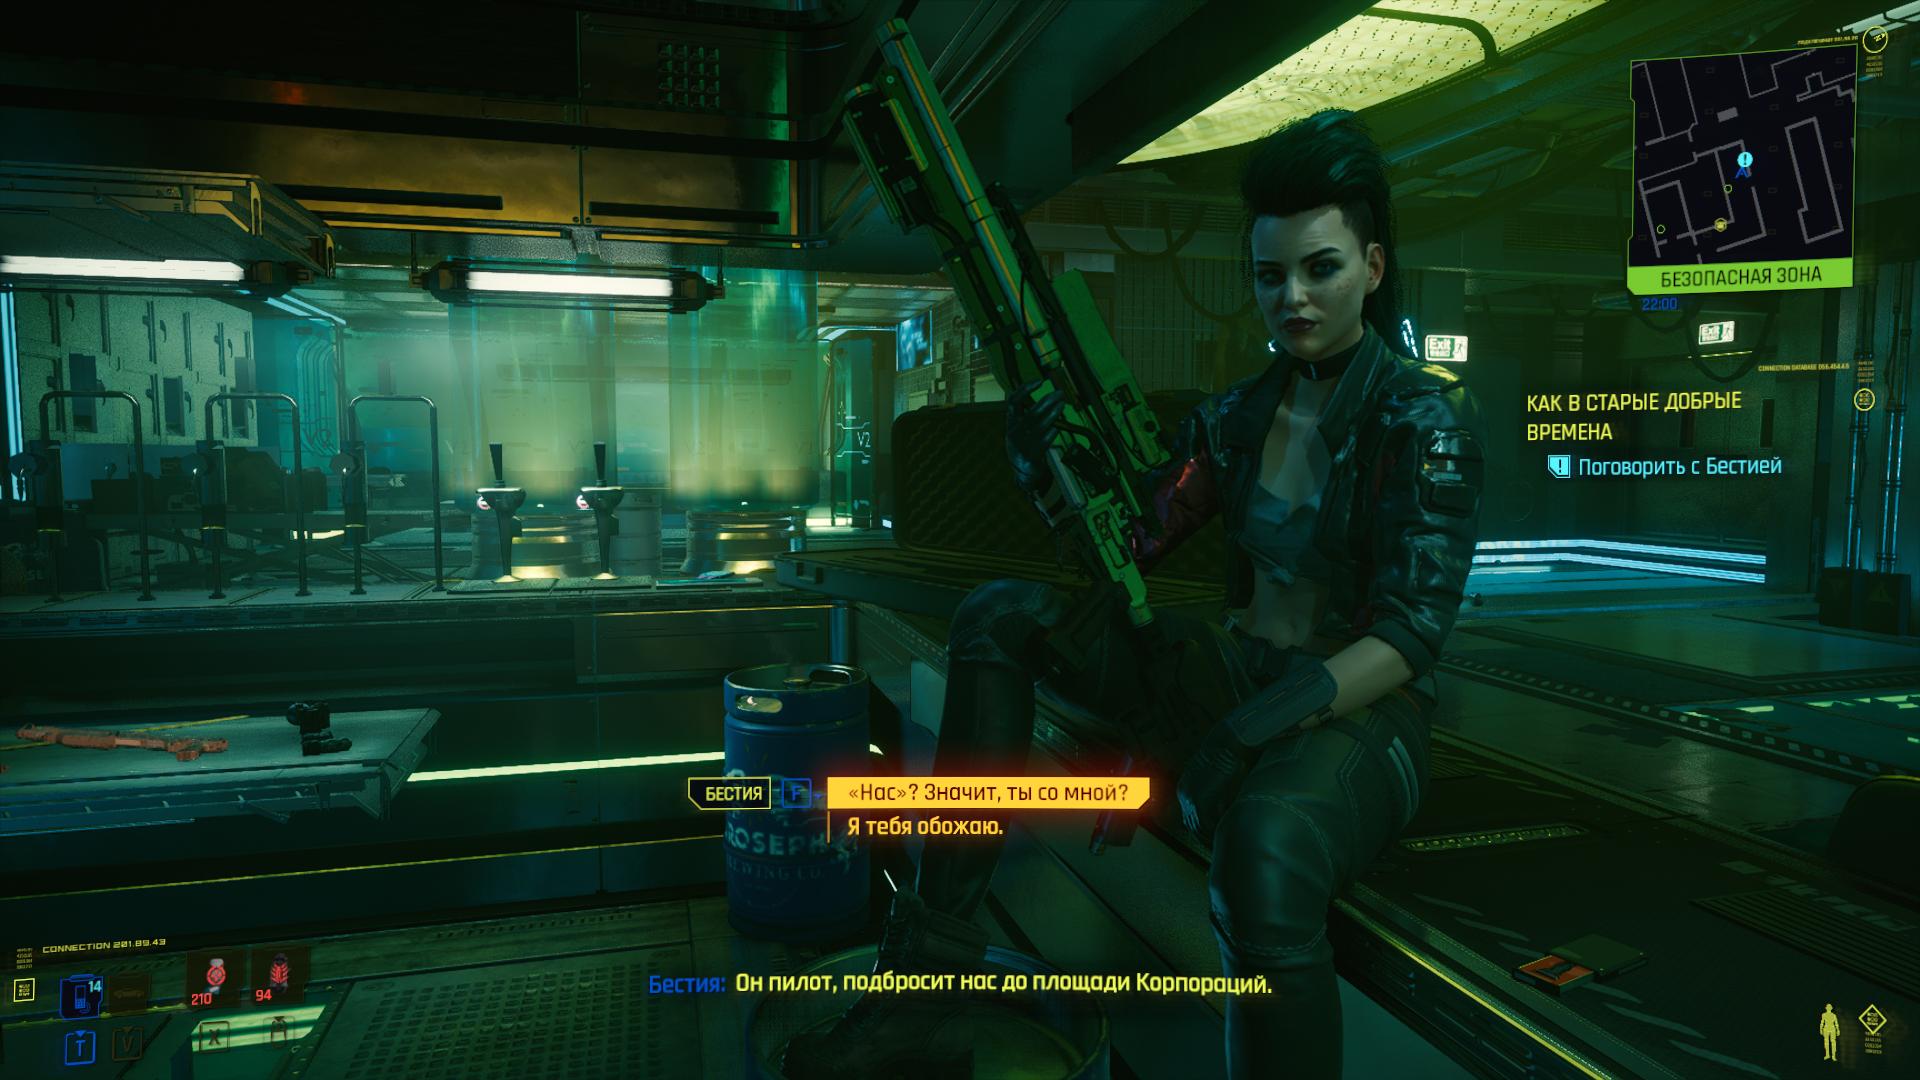 Cyberpunk 2077 Screenshot 2021.01.12 - 02.41.41.71.png - Cyberpunk 2077